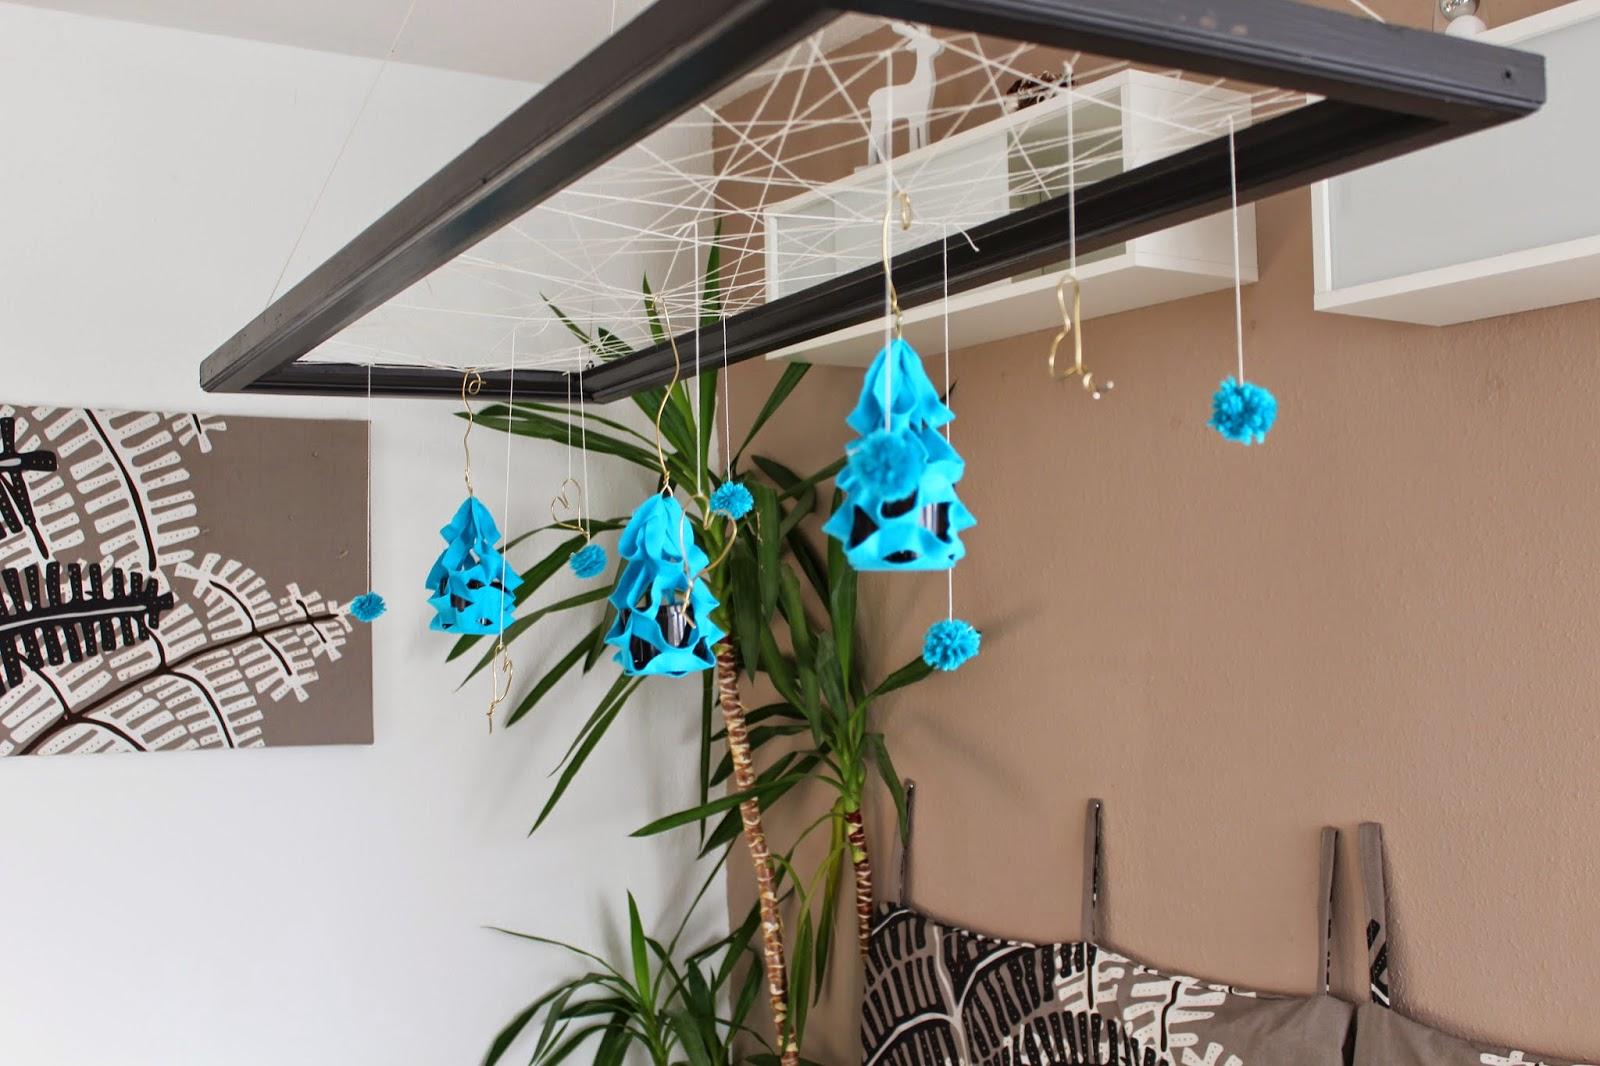 schnelle deko aus draht filz wolle. Black Bedroom Furniture Sets. Home Design Ideas